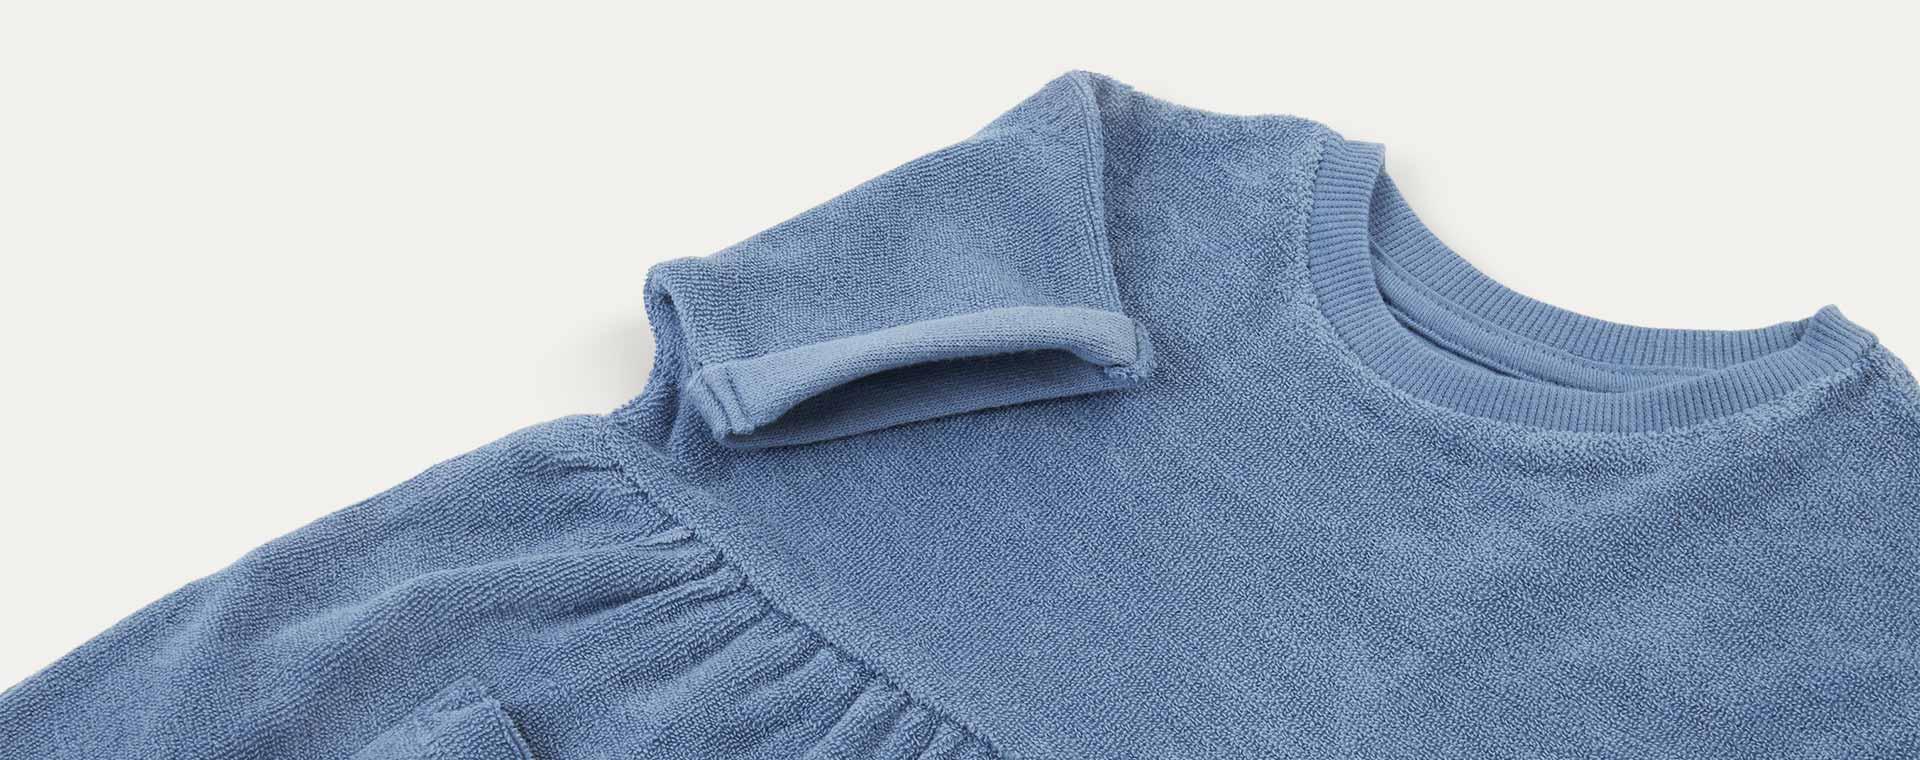 Sky KIDLY Label Towelling Dress